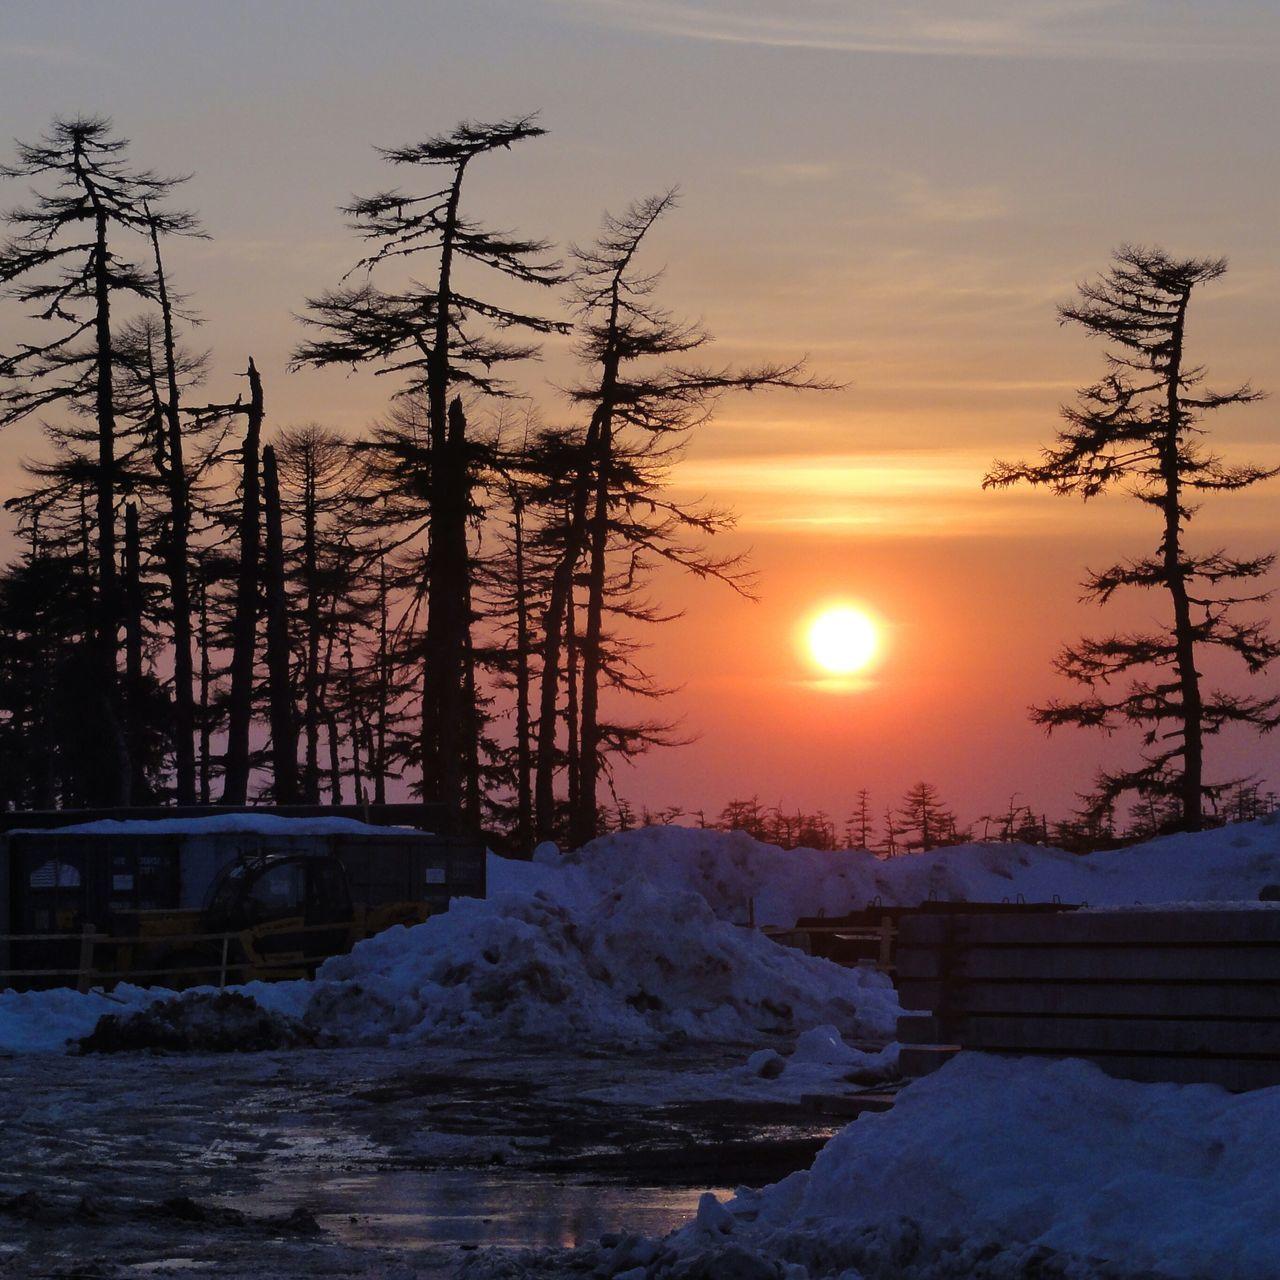 На севере о.Сахалин (Sakhalin island) Fareast Snow ❄ Winter Nature Sunset Silhouettes Sunset Sunset_collection Forest